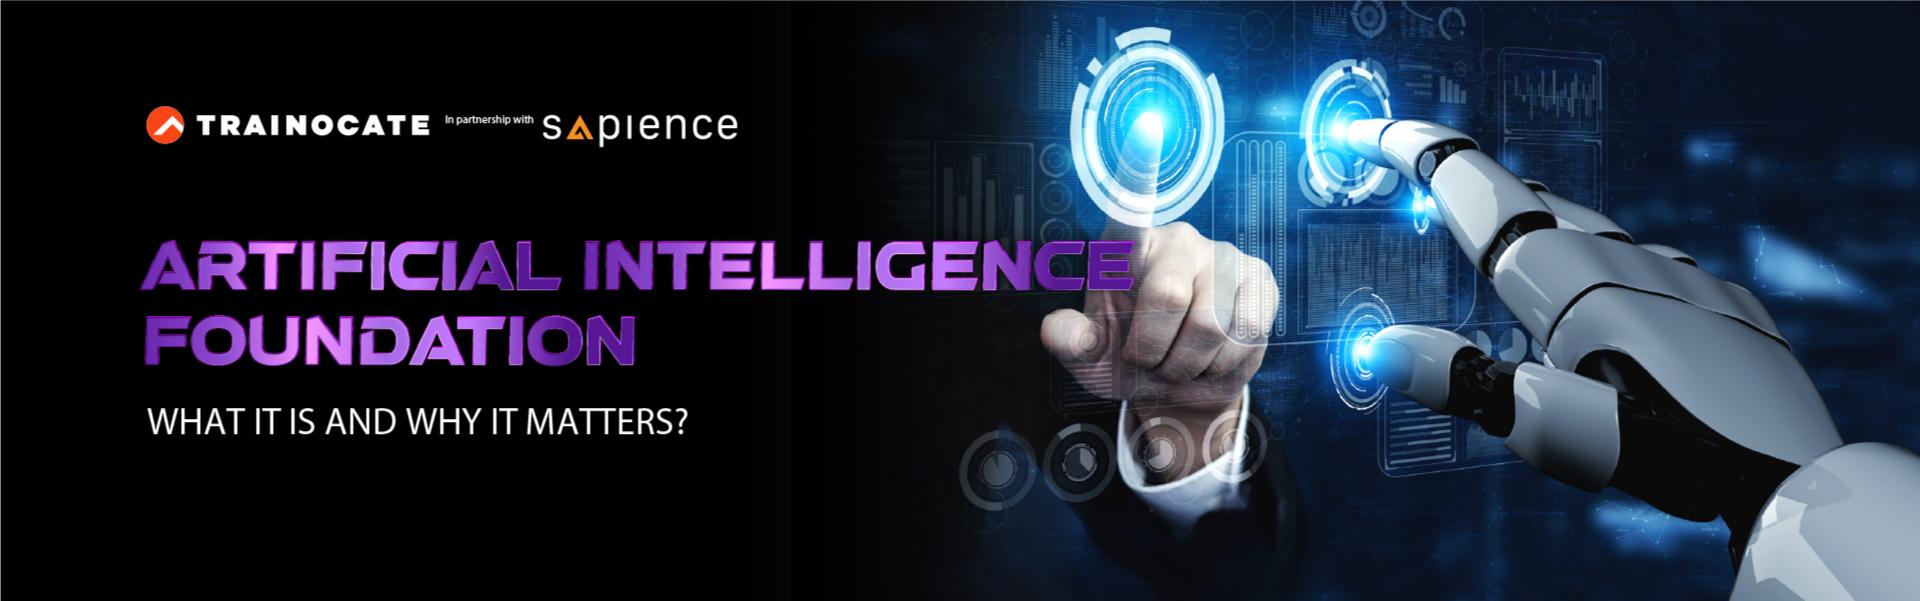 artificial-intelligence-foundation-2021_highlight1